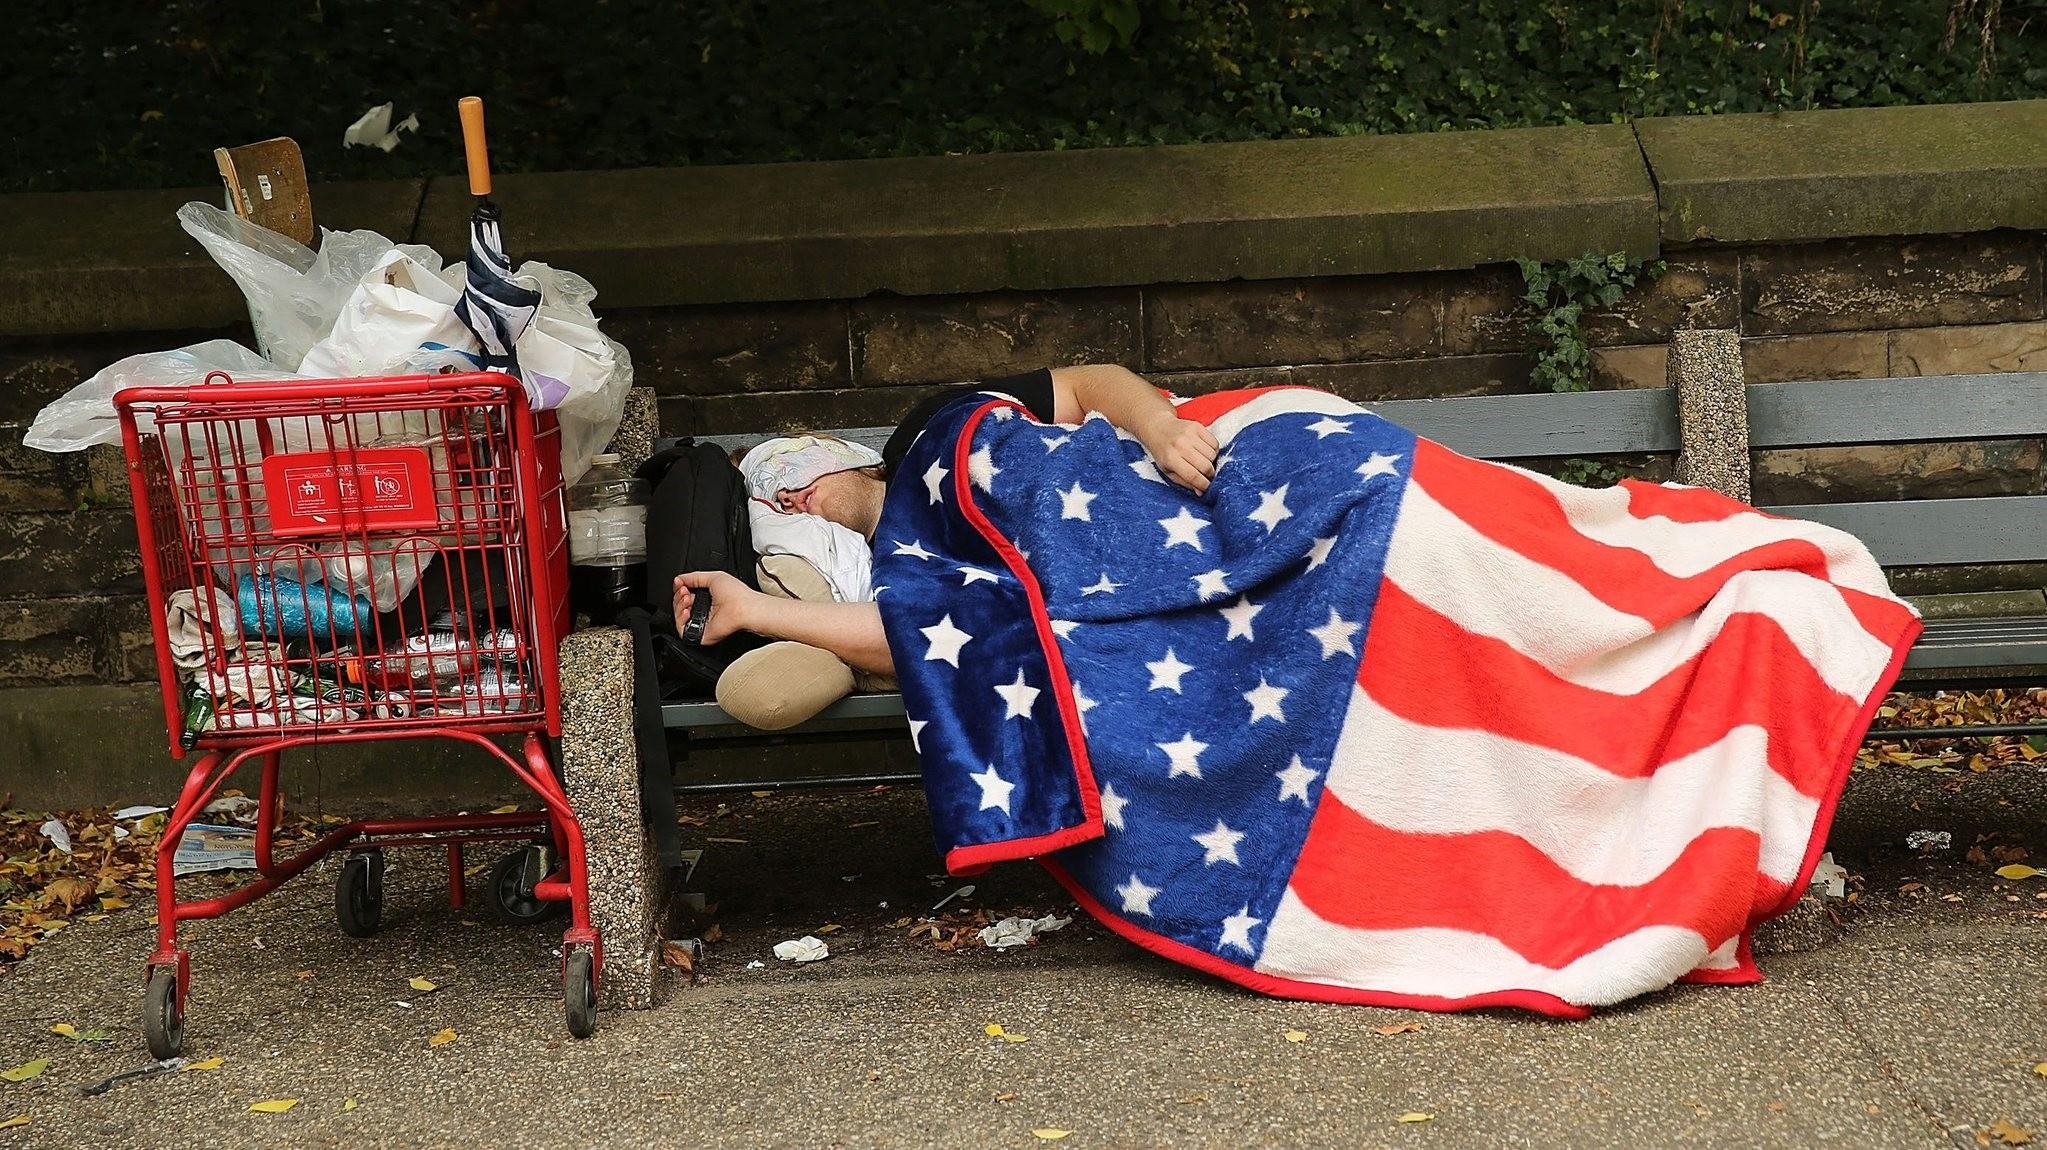 A homeless man sleeps under an American flag blanket on a park bench in New York City.